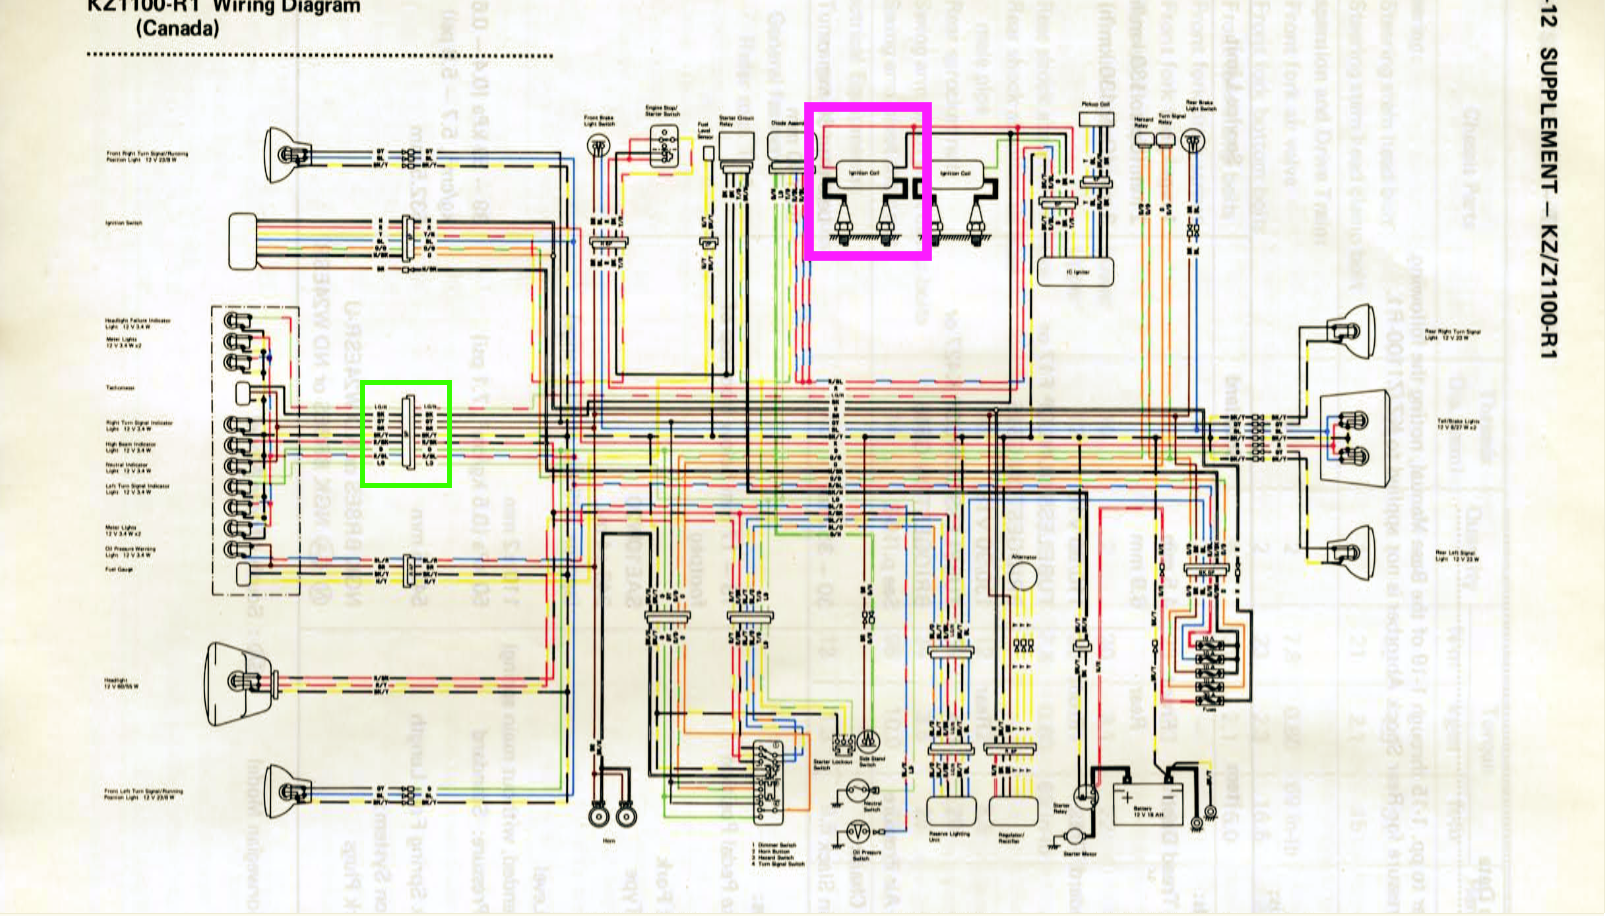 1983 kz1100 shaft erratic tach and non-op voltmeter. - page 2 - kzrider  forum - kzrider, kz, z1 & z motorcycle enthusiast's forum  kzrider